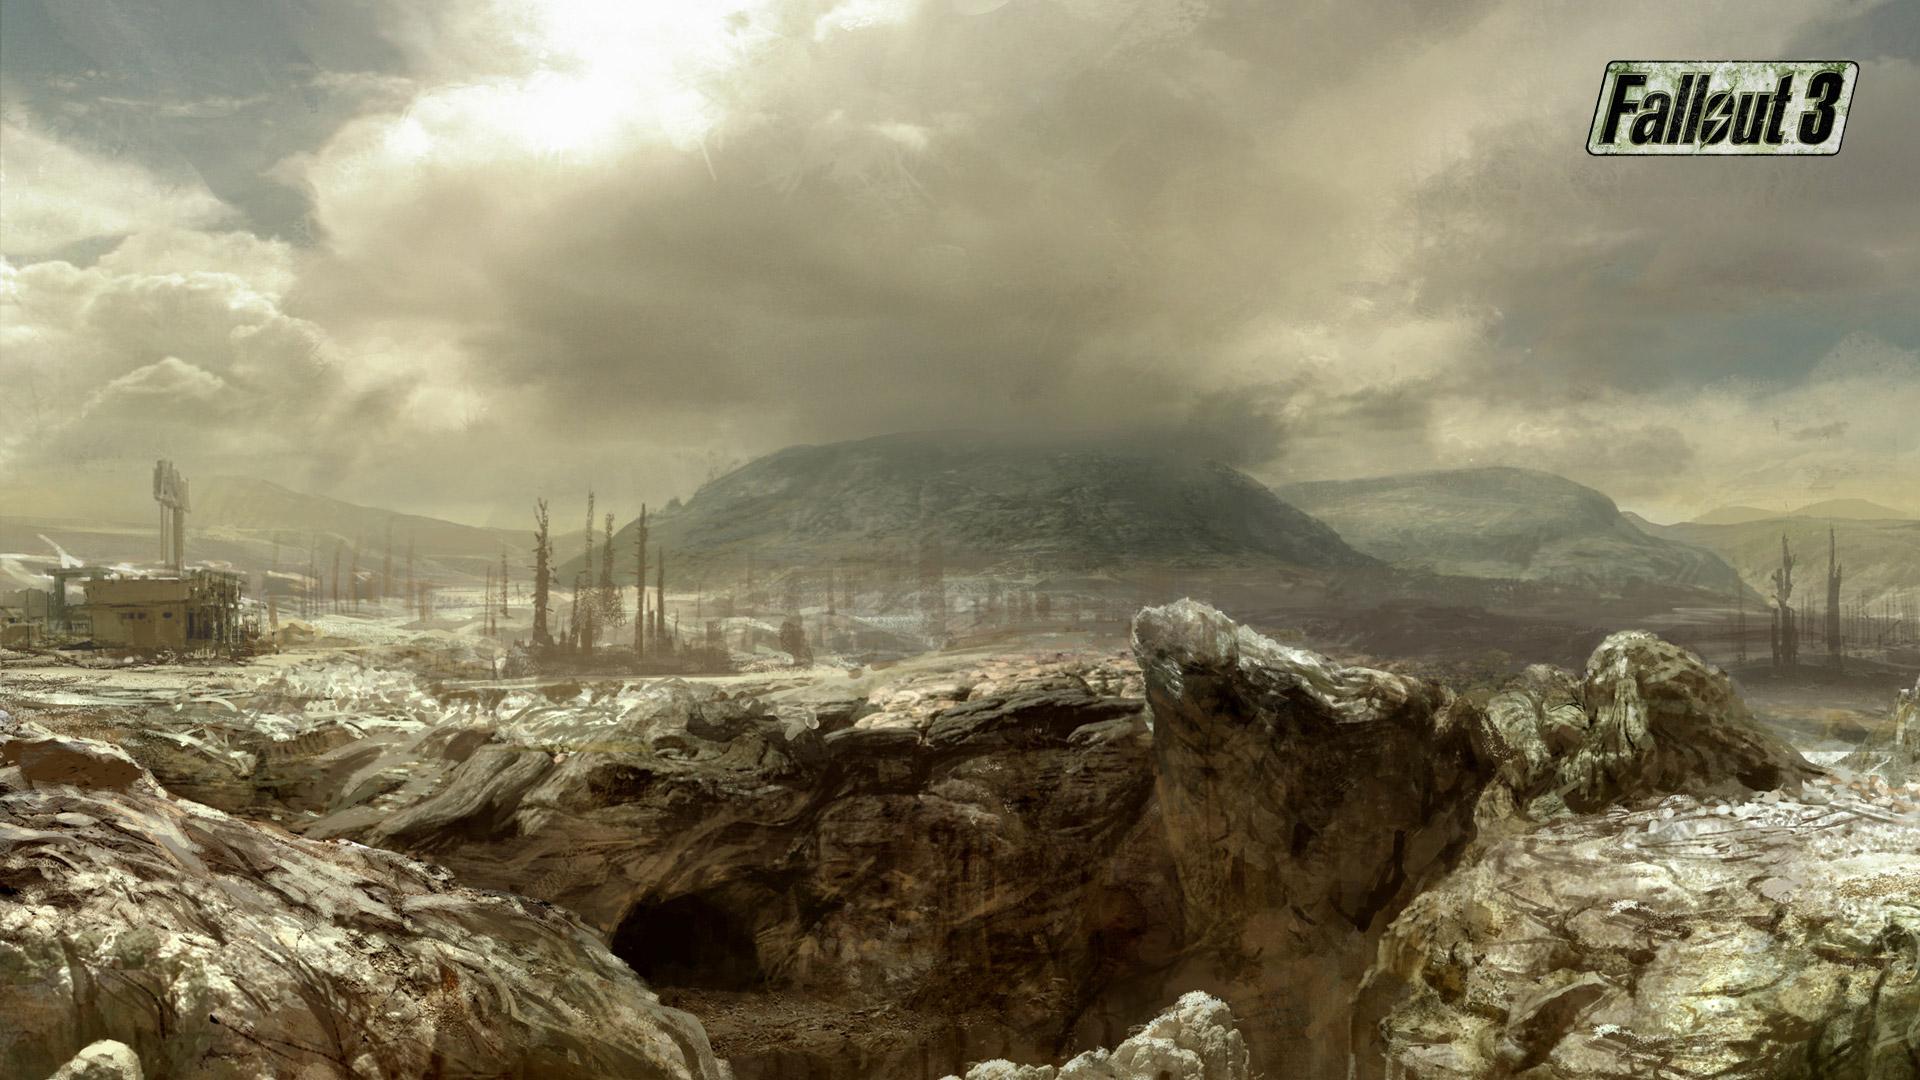 Fallout 3 Wallpaper in 1920x1080 1920x1080